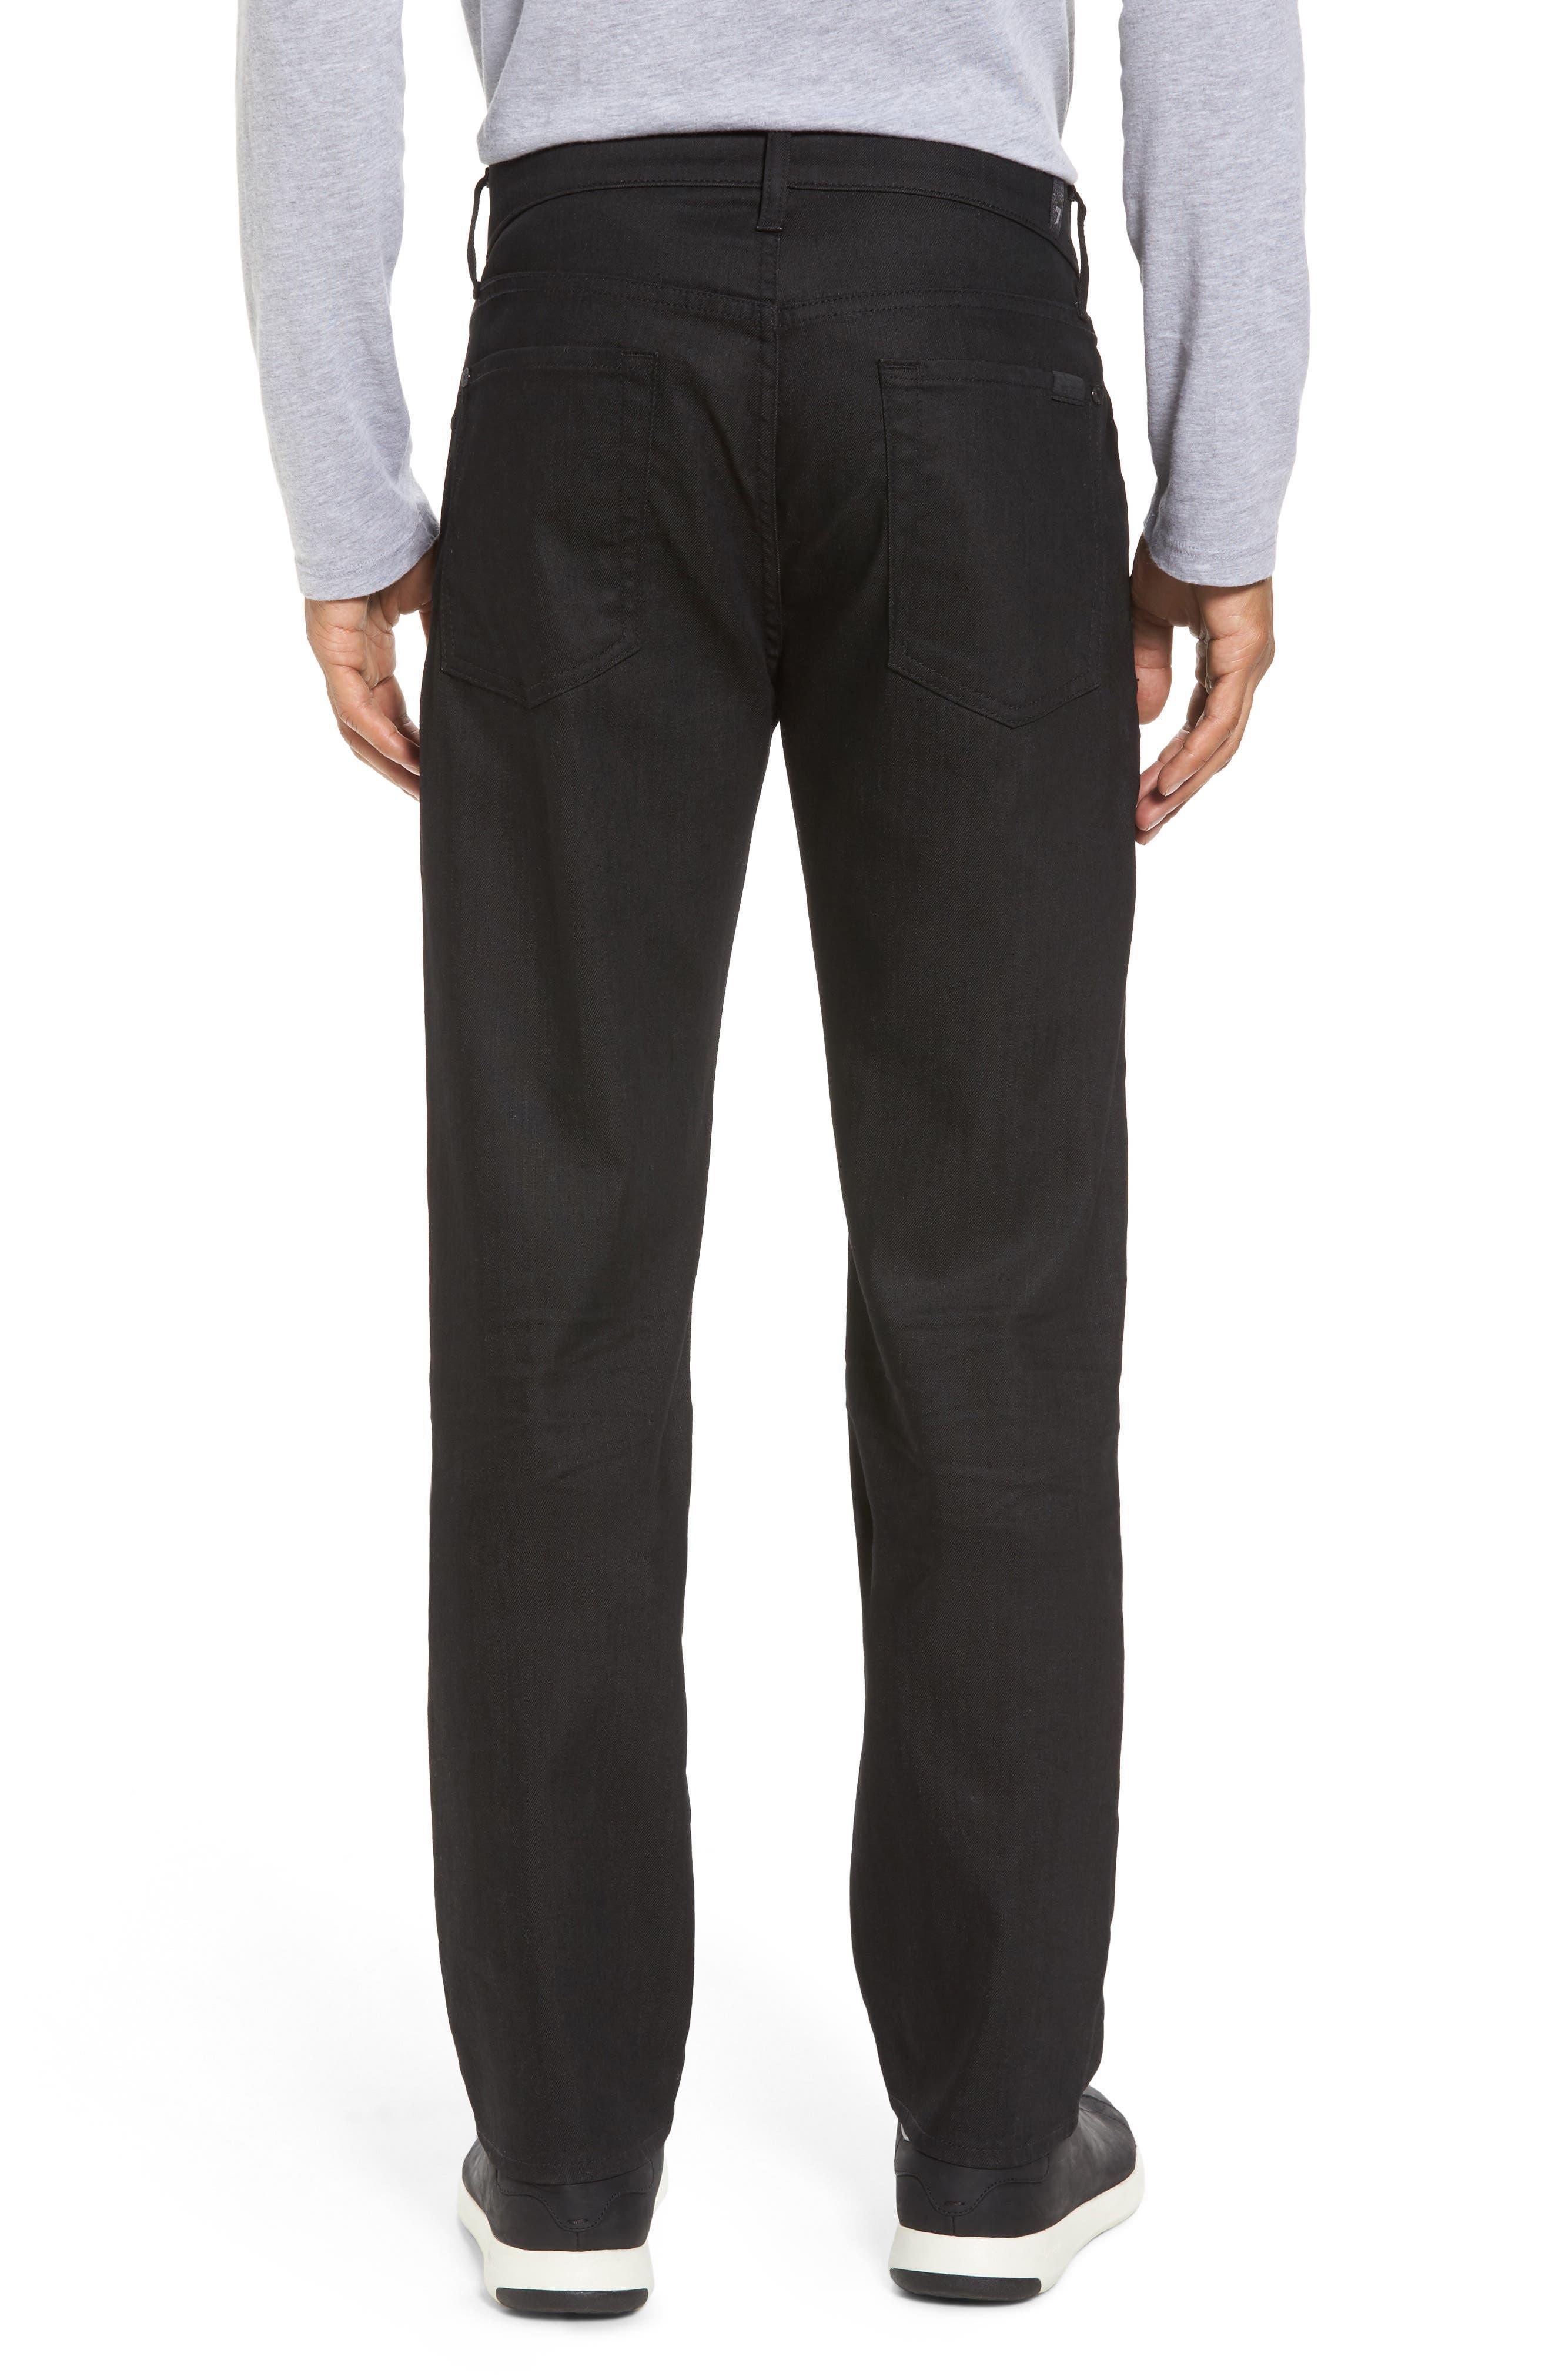 Alternate Image 2  - 7 For All Mankind® Airweft - Slimmy Slim Fit Jeans (Soiree Black)